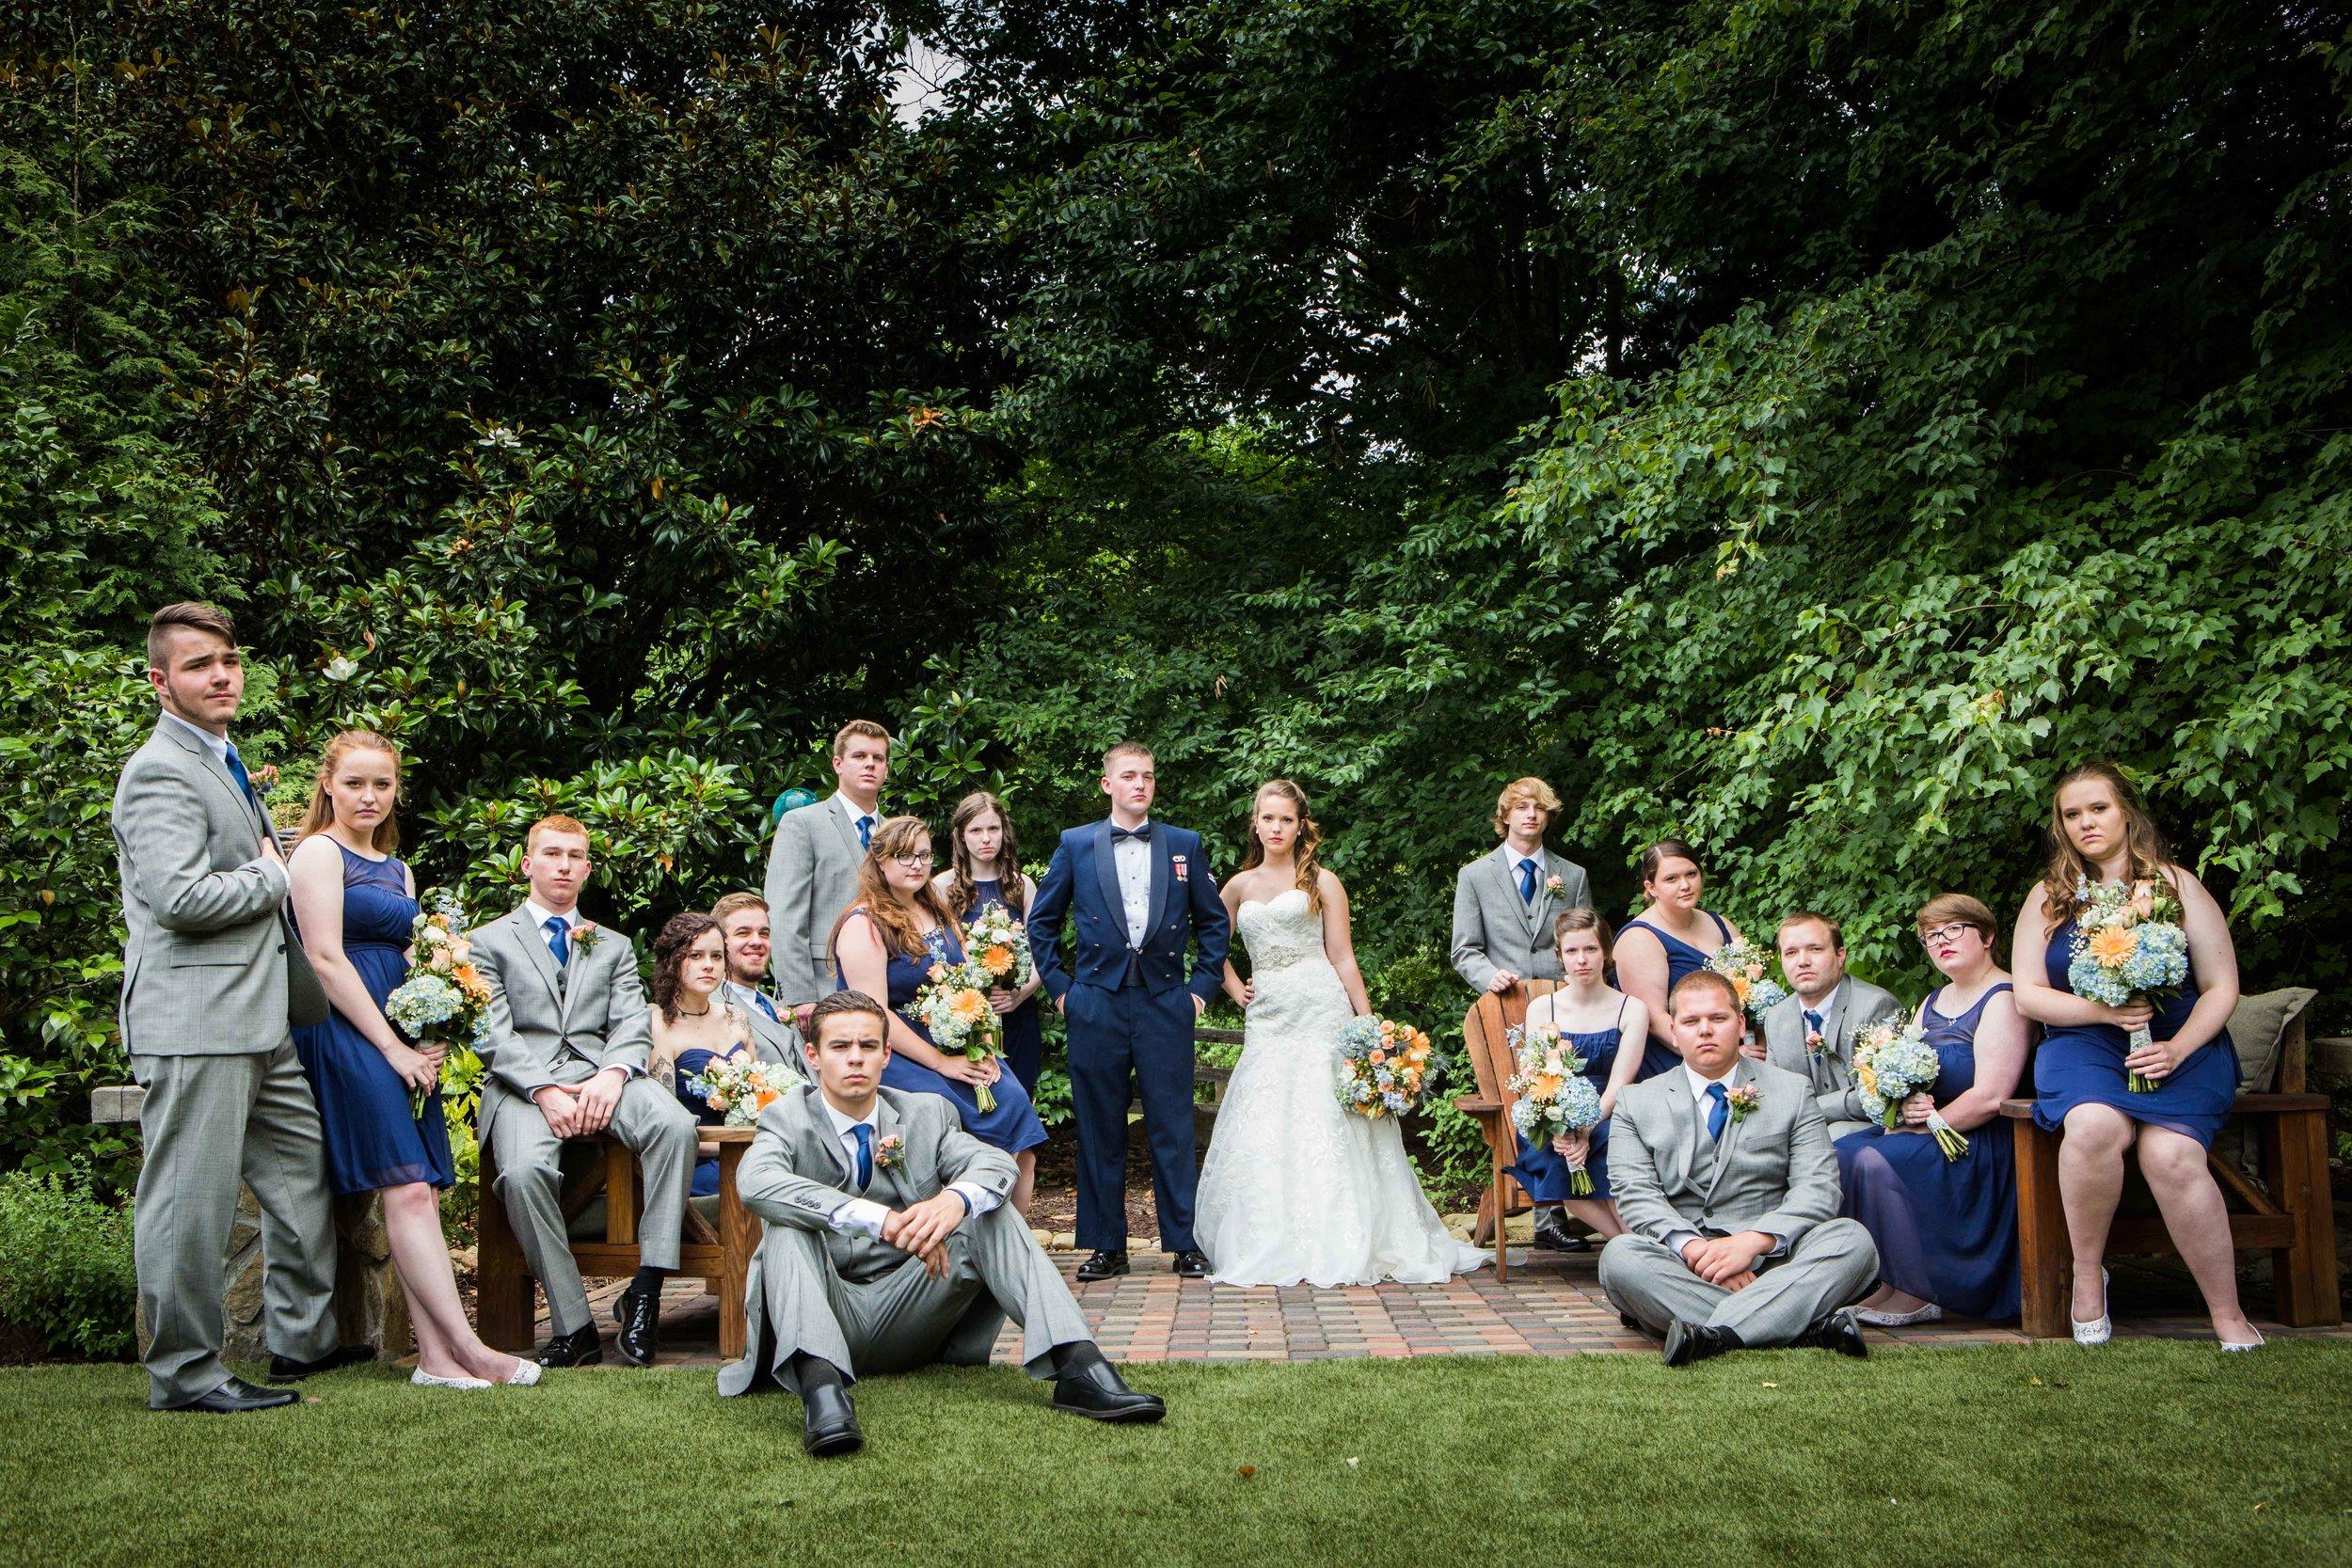 060416_Norris_Smith_Wedding_CF_11767.jpg